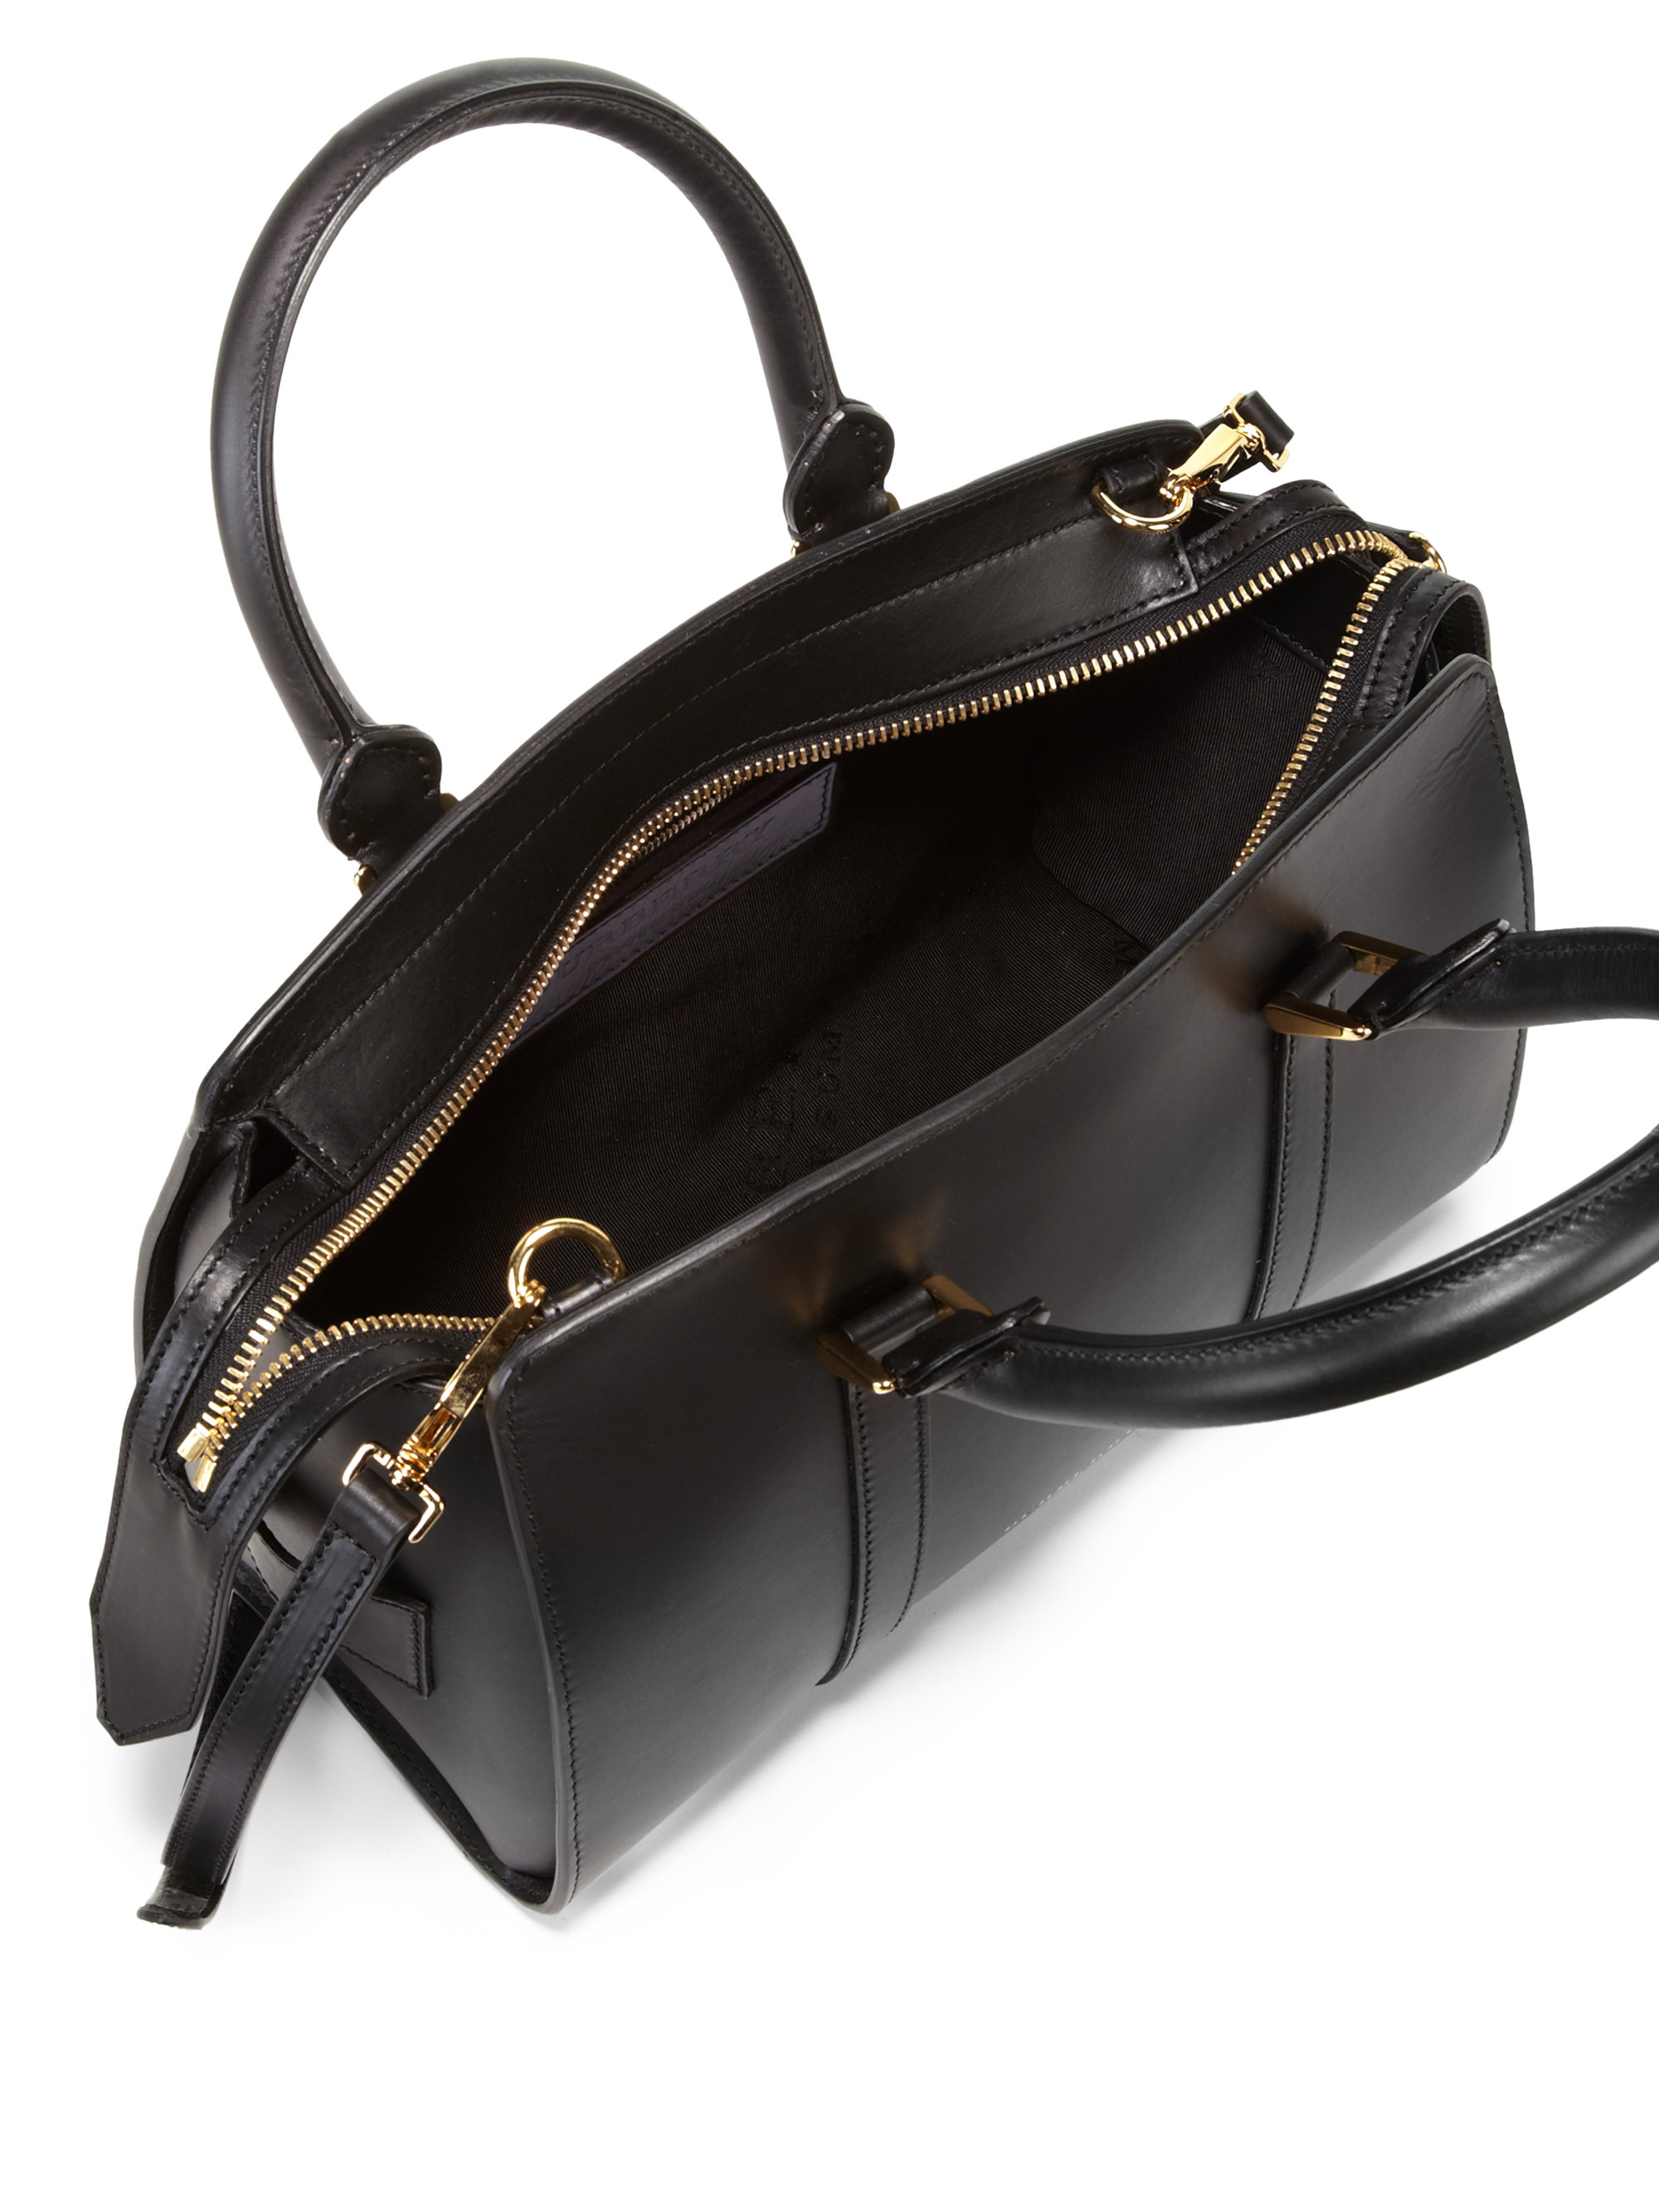 Burberry Bags Black